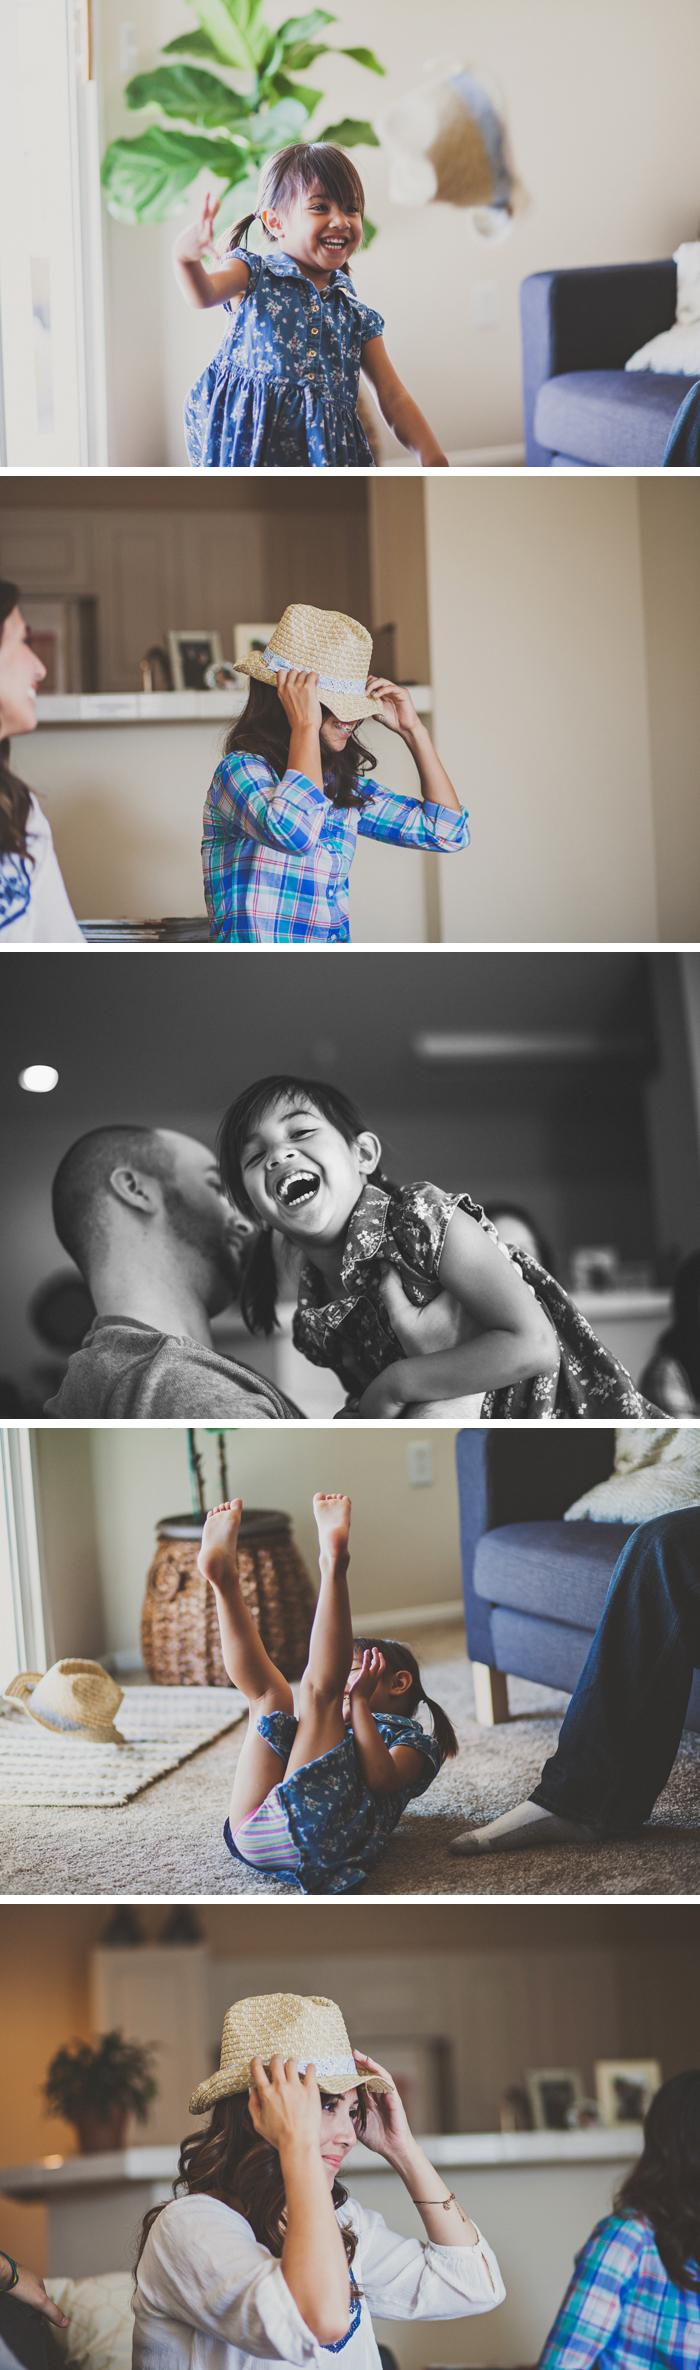 Temeucla Family Photos Photographer